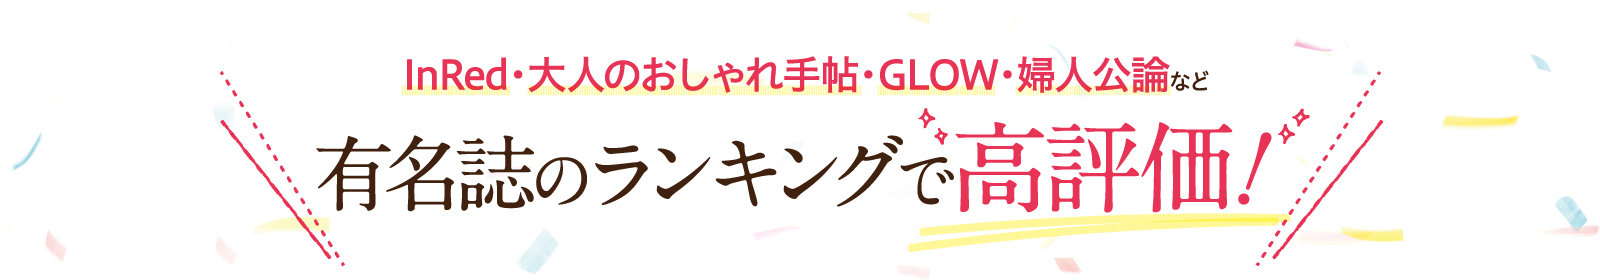 InRed・大人のおしゃれ手帖・GLOW・婦人公論など有名誌のランキングで高評価!